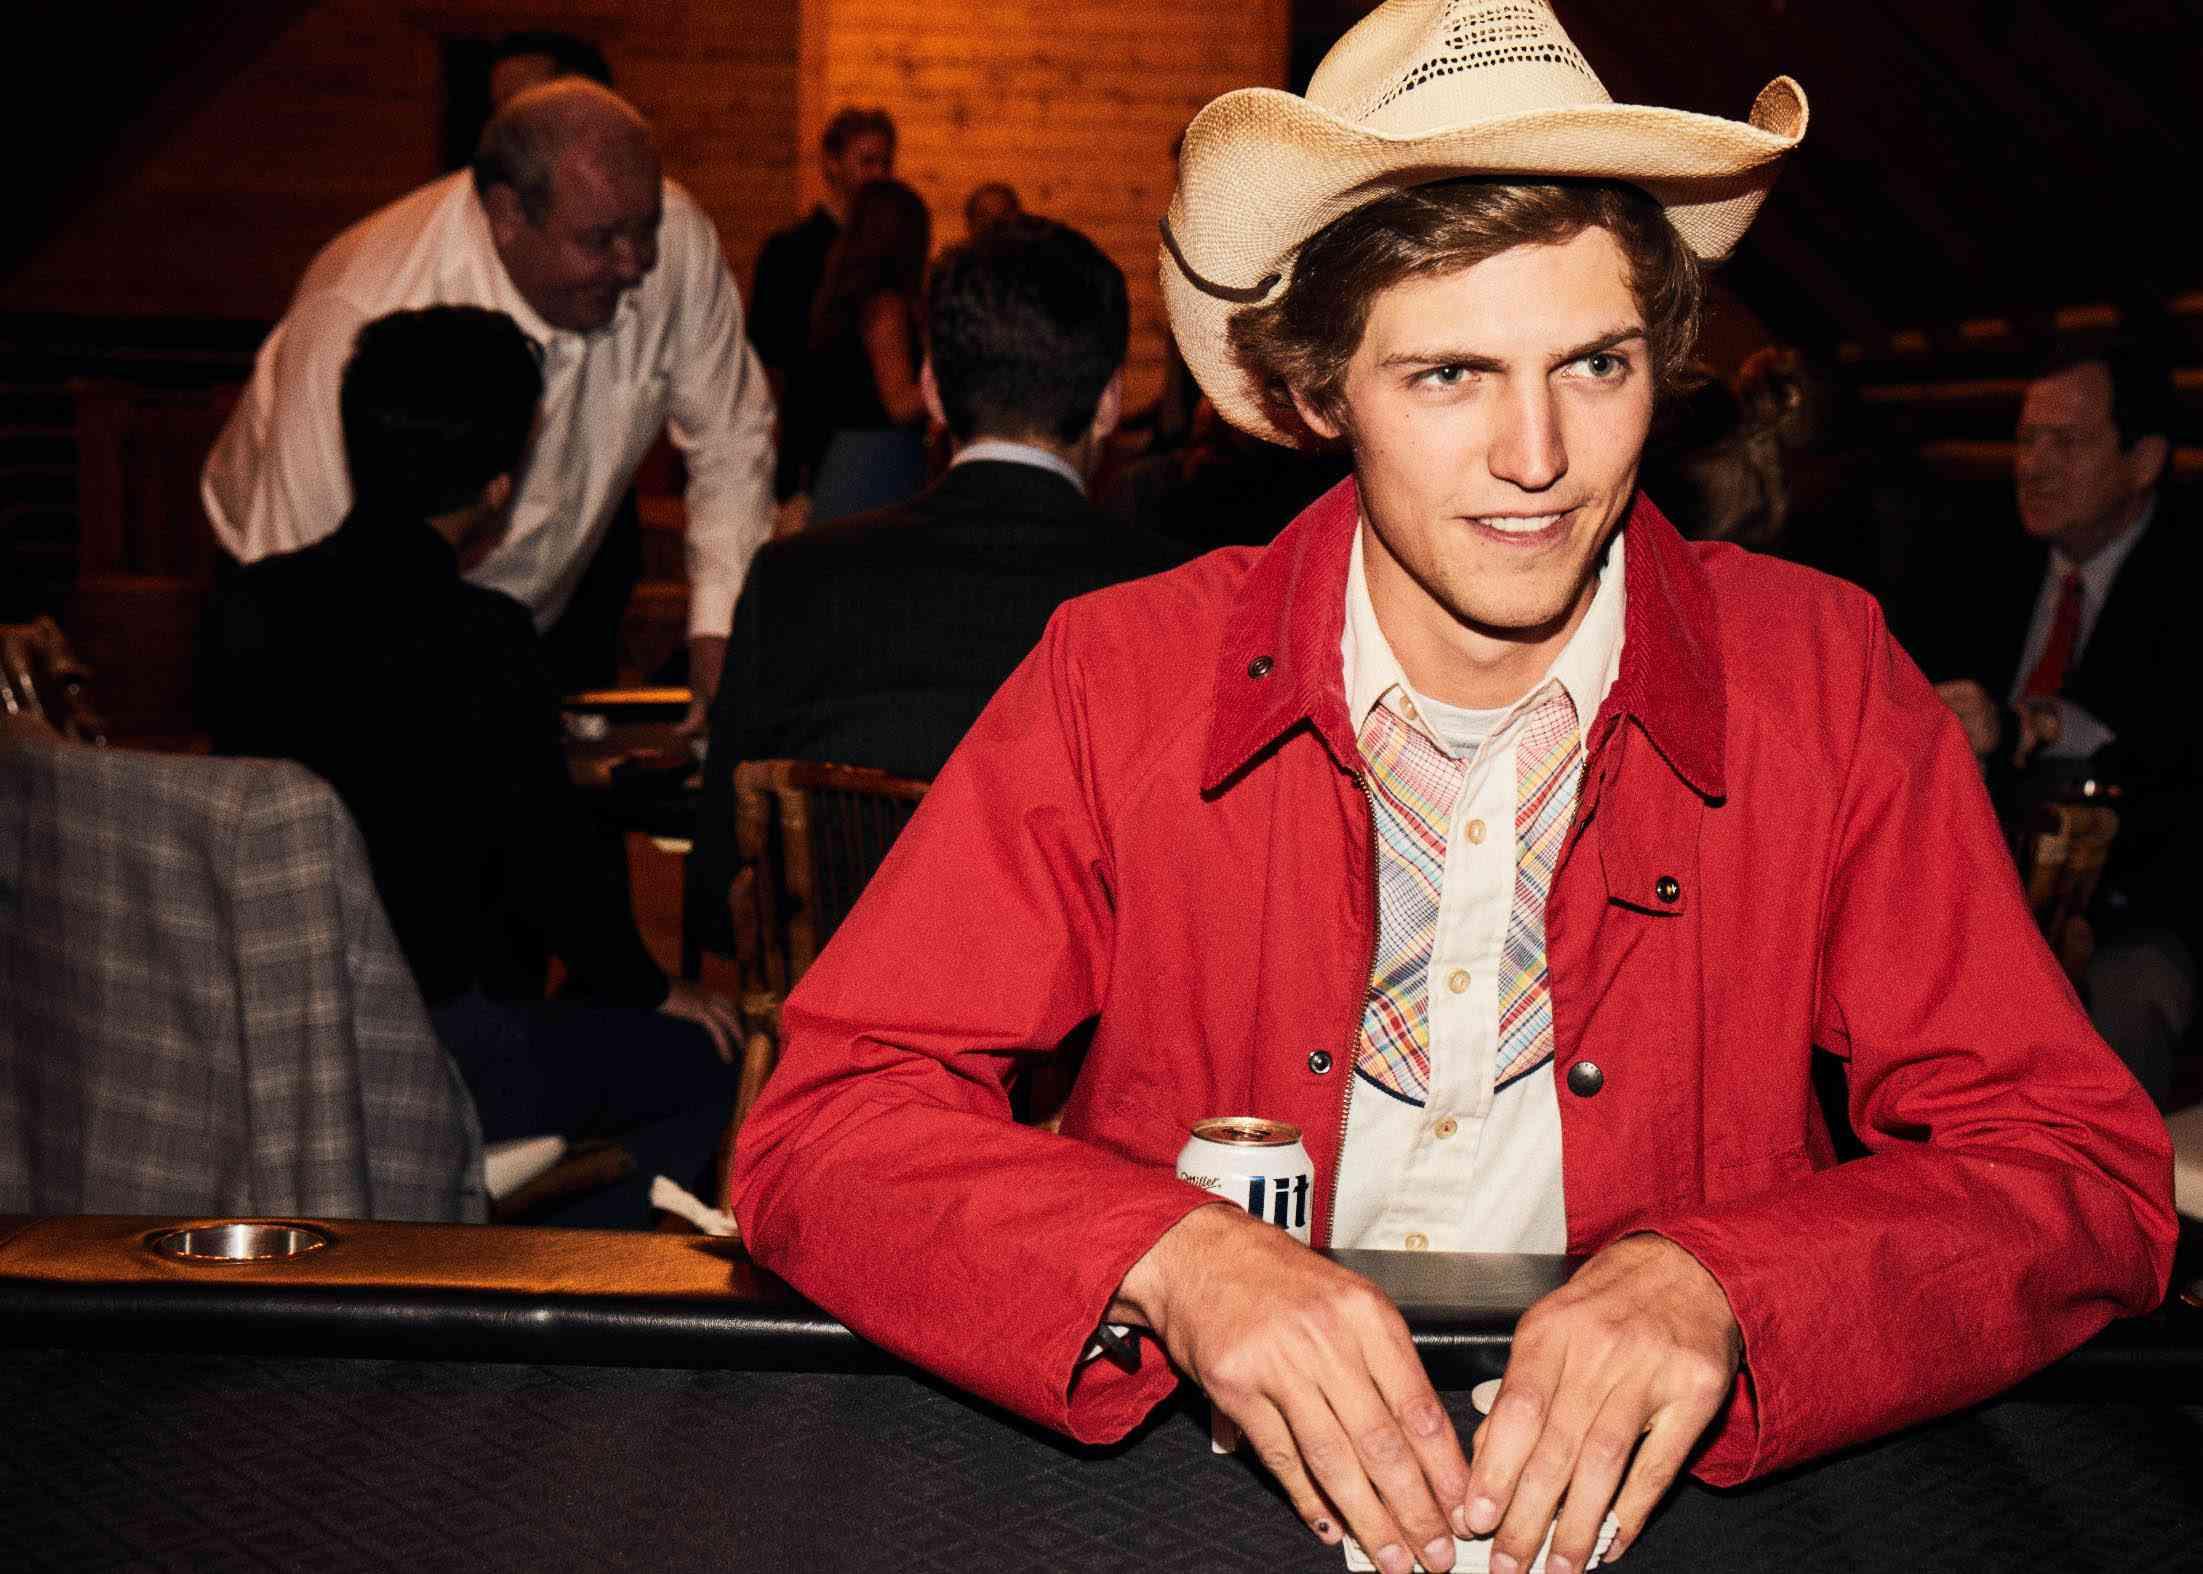 Guest in cowboy hat